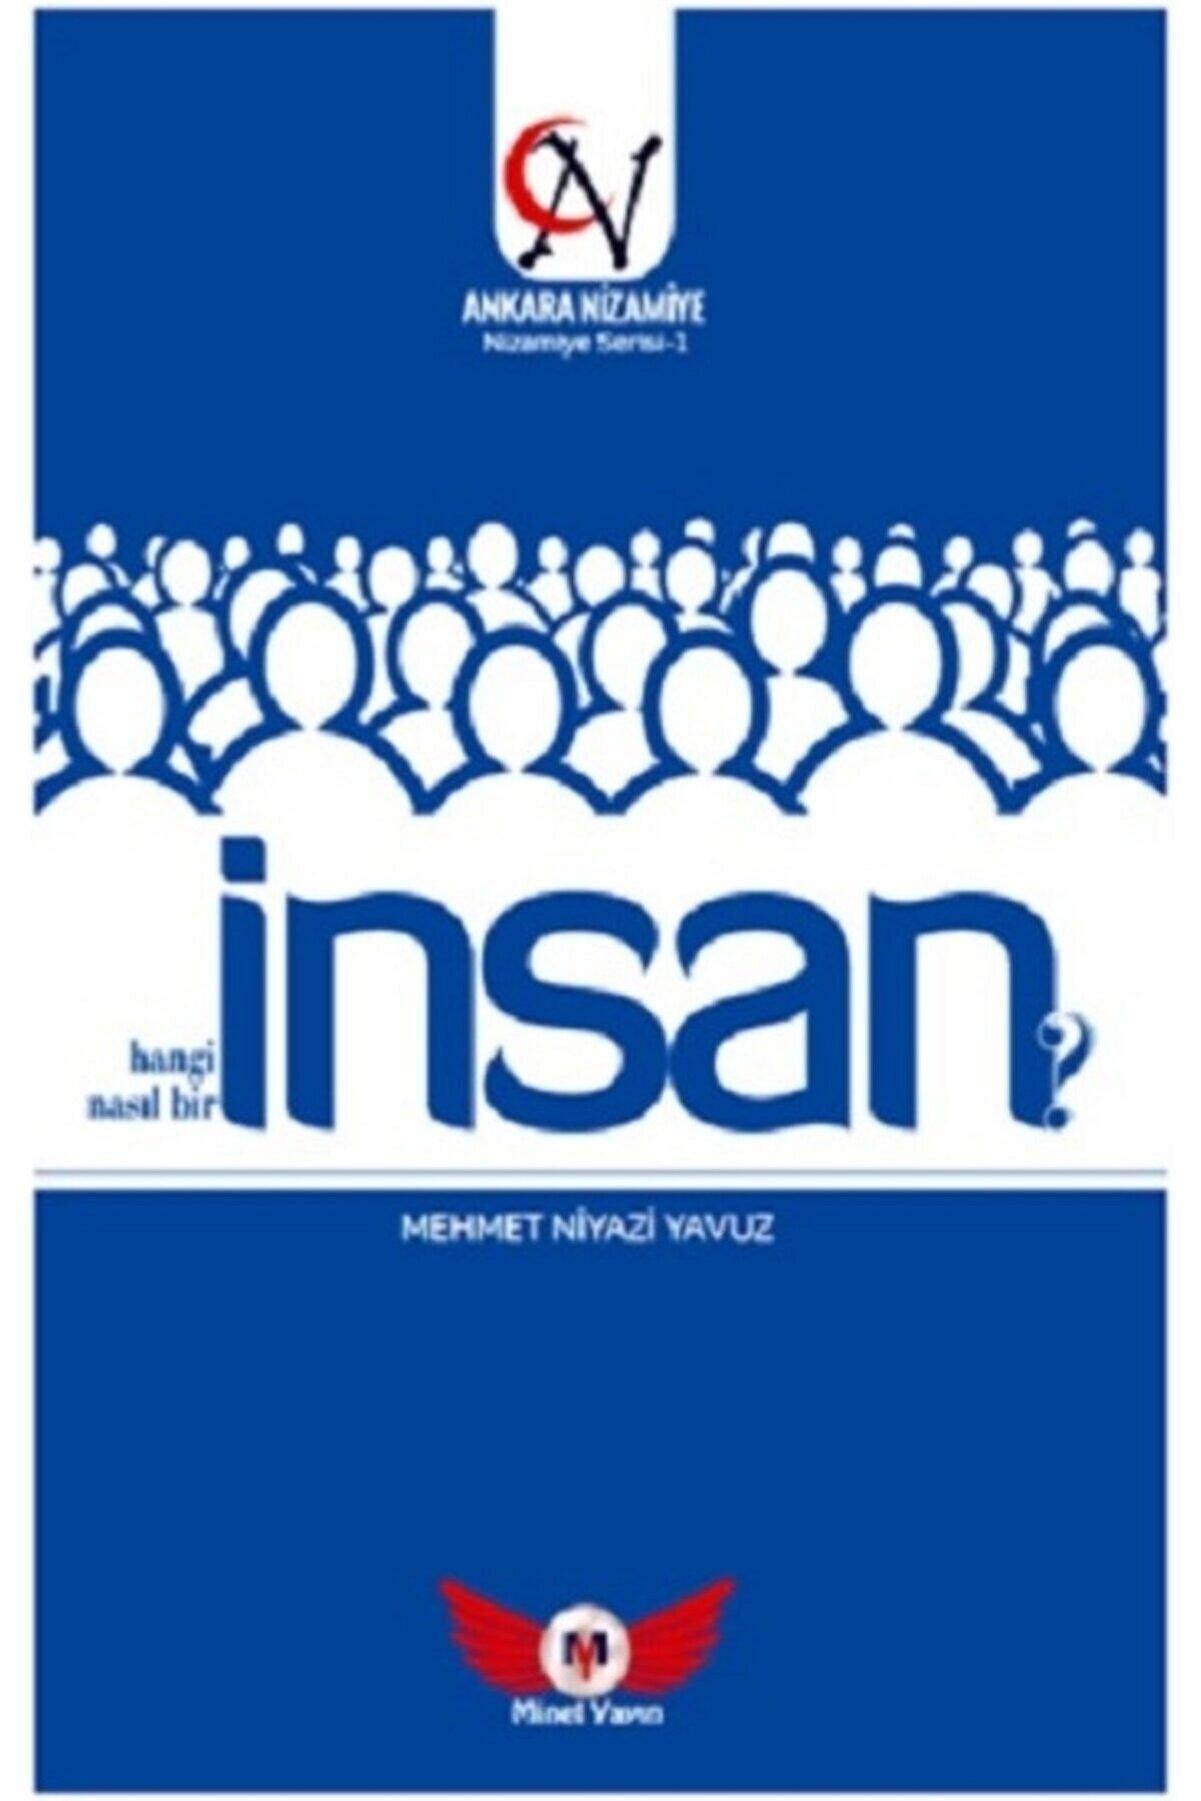 Minel Yayın Insan Hangi Insan? Nasıl Bir Insan? - Mehmet Niyazi Yavuz 9786057022707